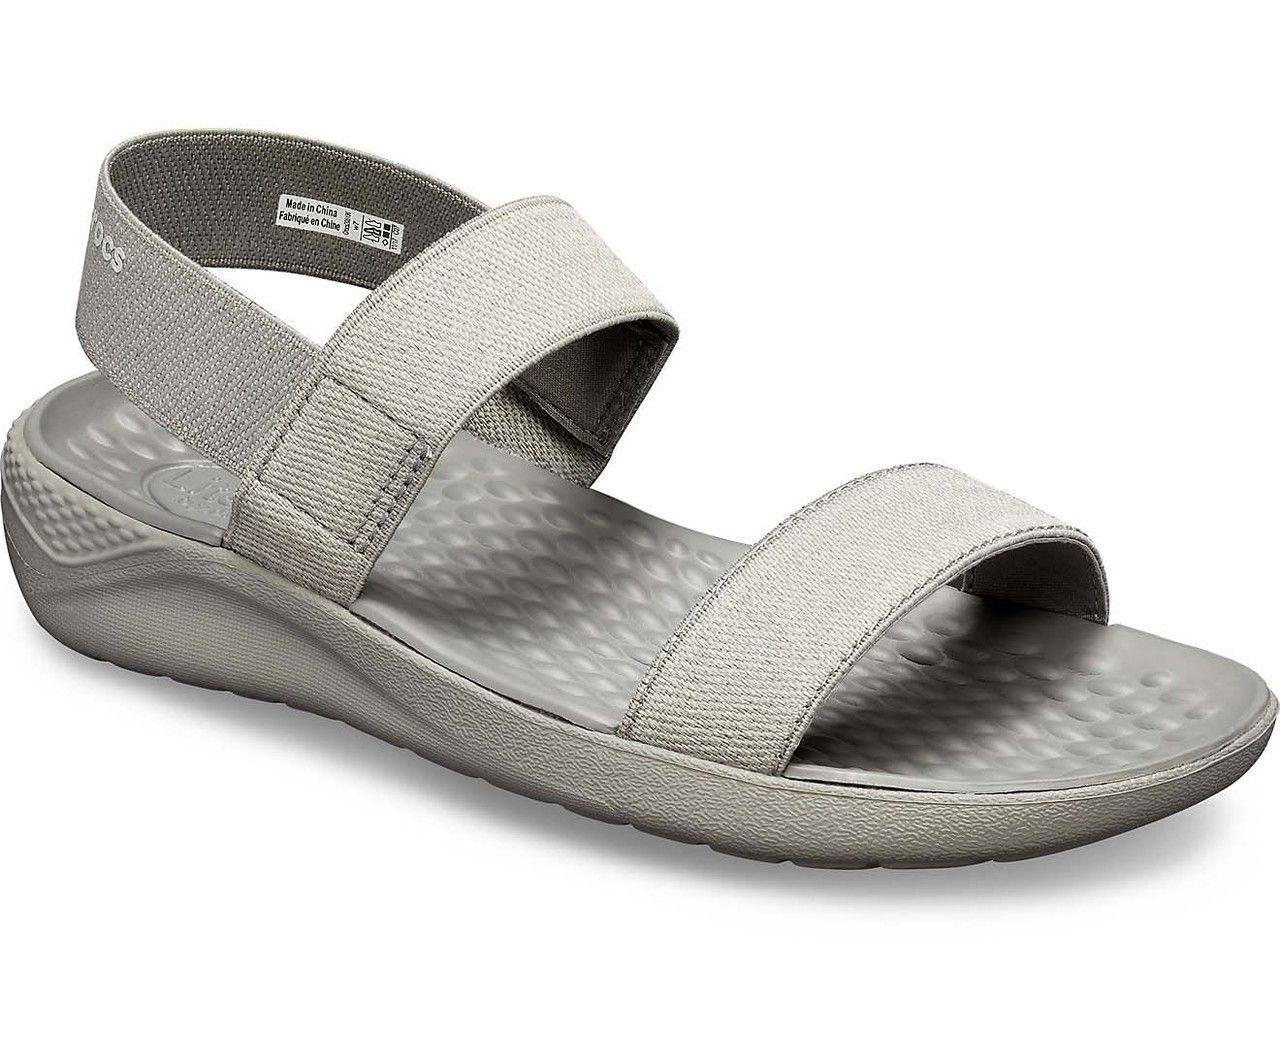 Crocs Women S Literide Sandal 205106 08d Womens Sandals Womens Shoes Sneakers Womens Shoes High Heels